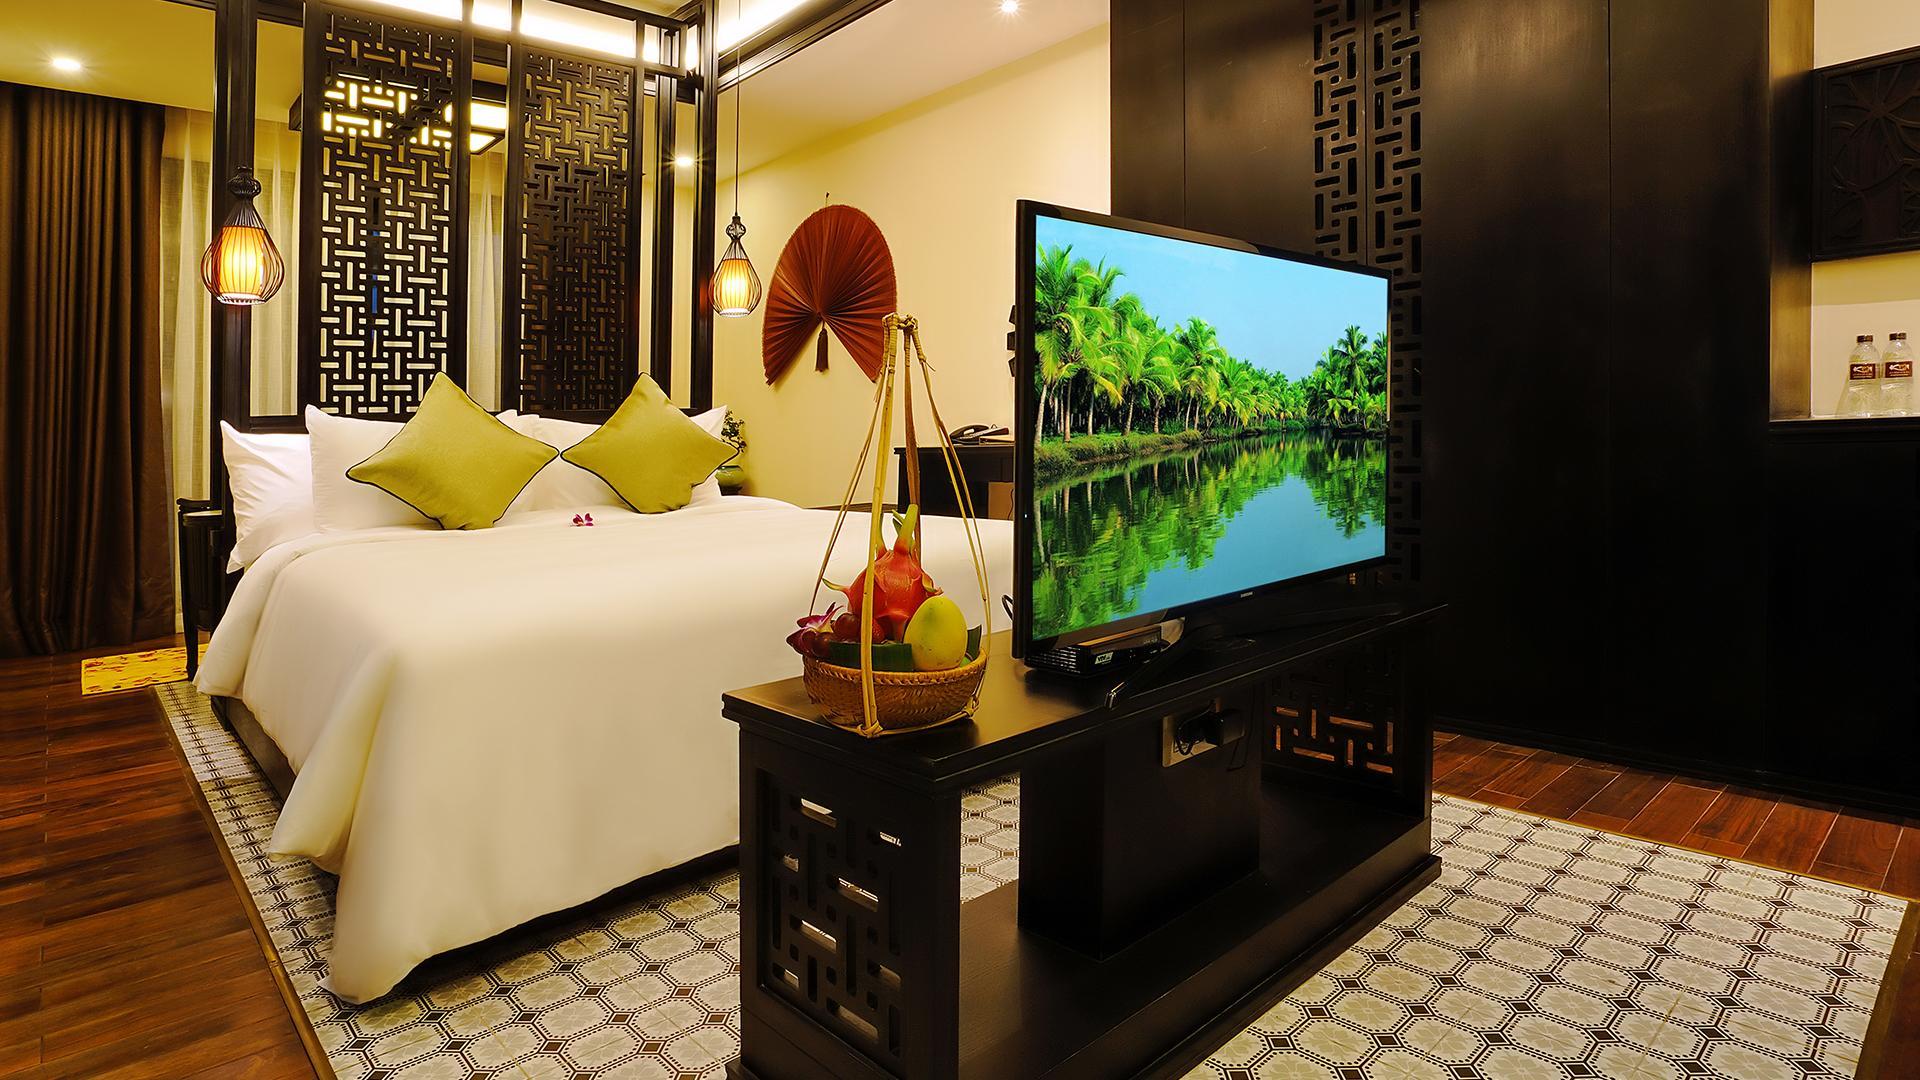 Garden View Bungalow image 1 at KOI Resort & Spa Hoi An - 2018 by null, Quảng Nam, Vietnam